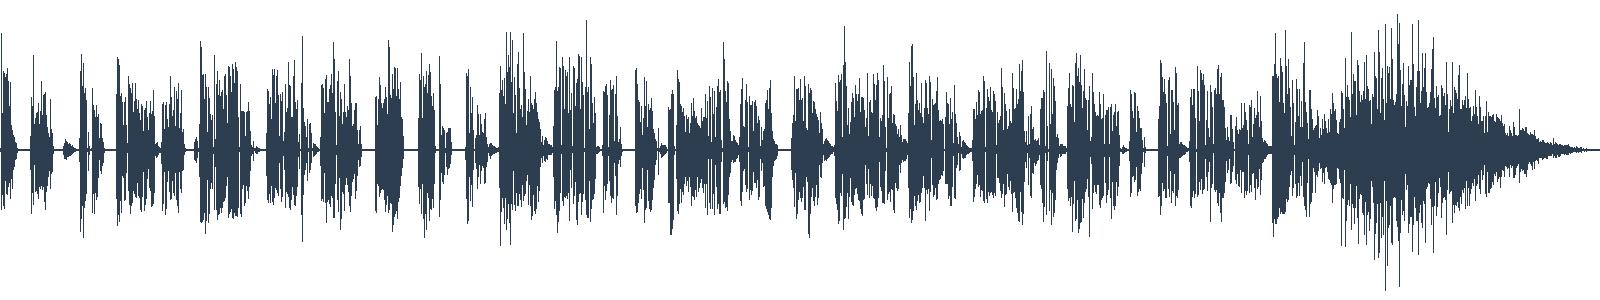 Kříďák - ukázka z audioknihy waveform